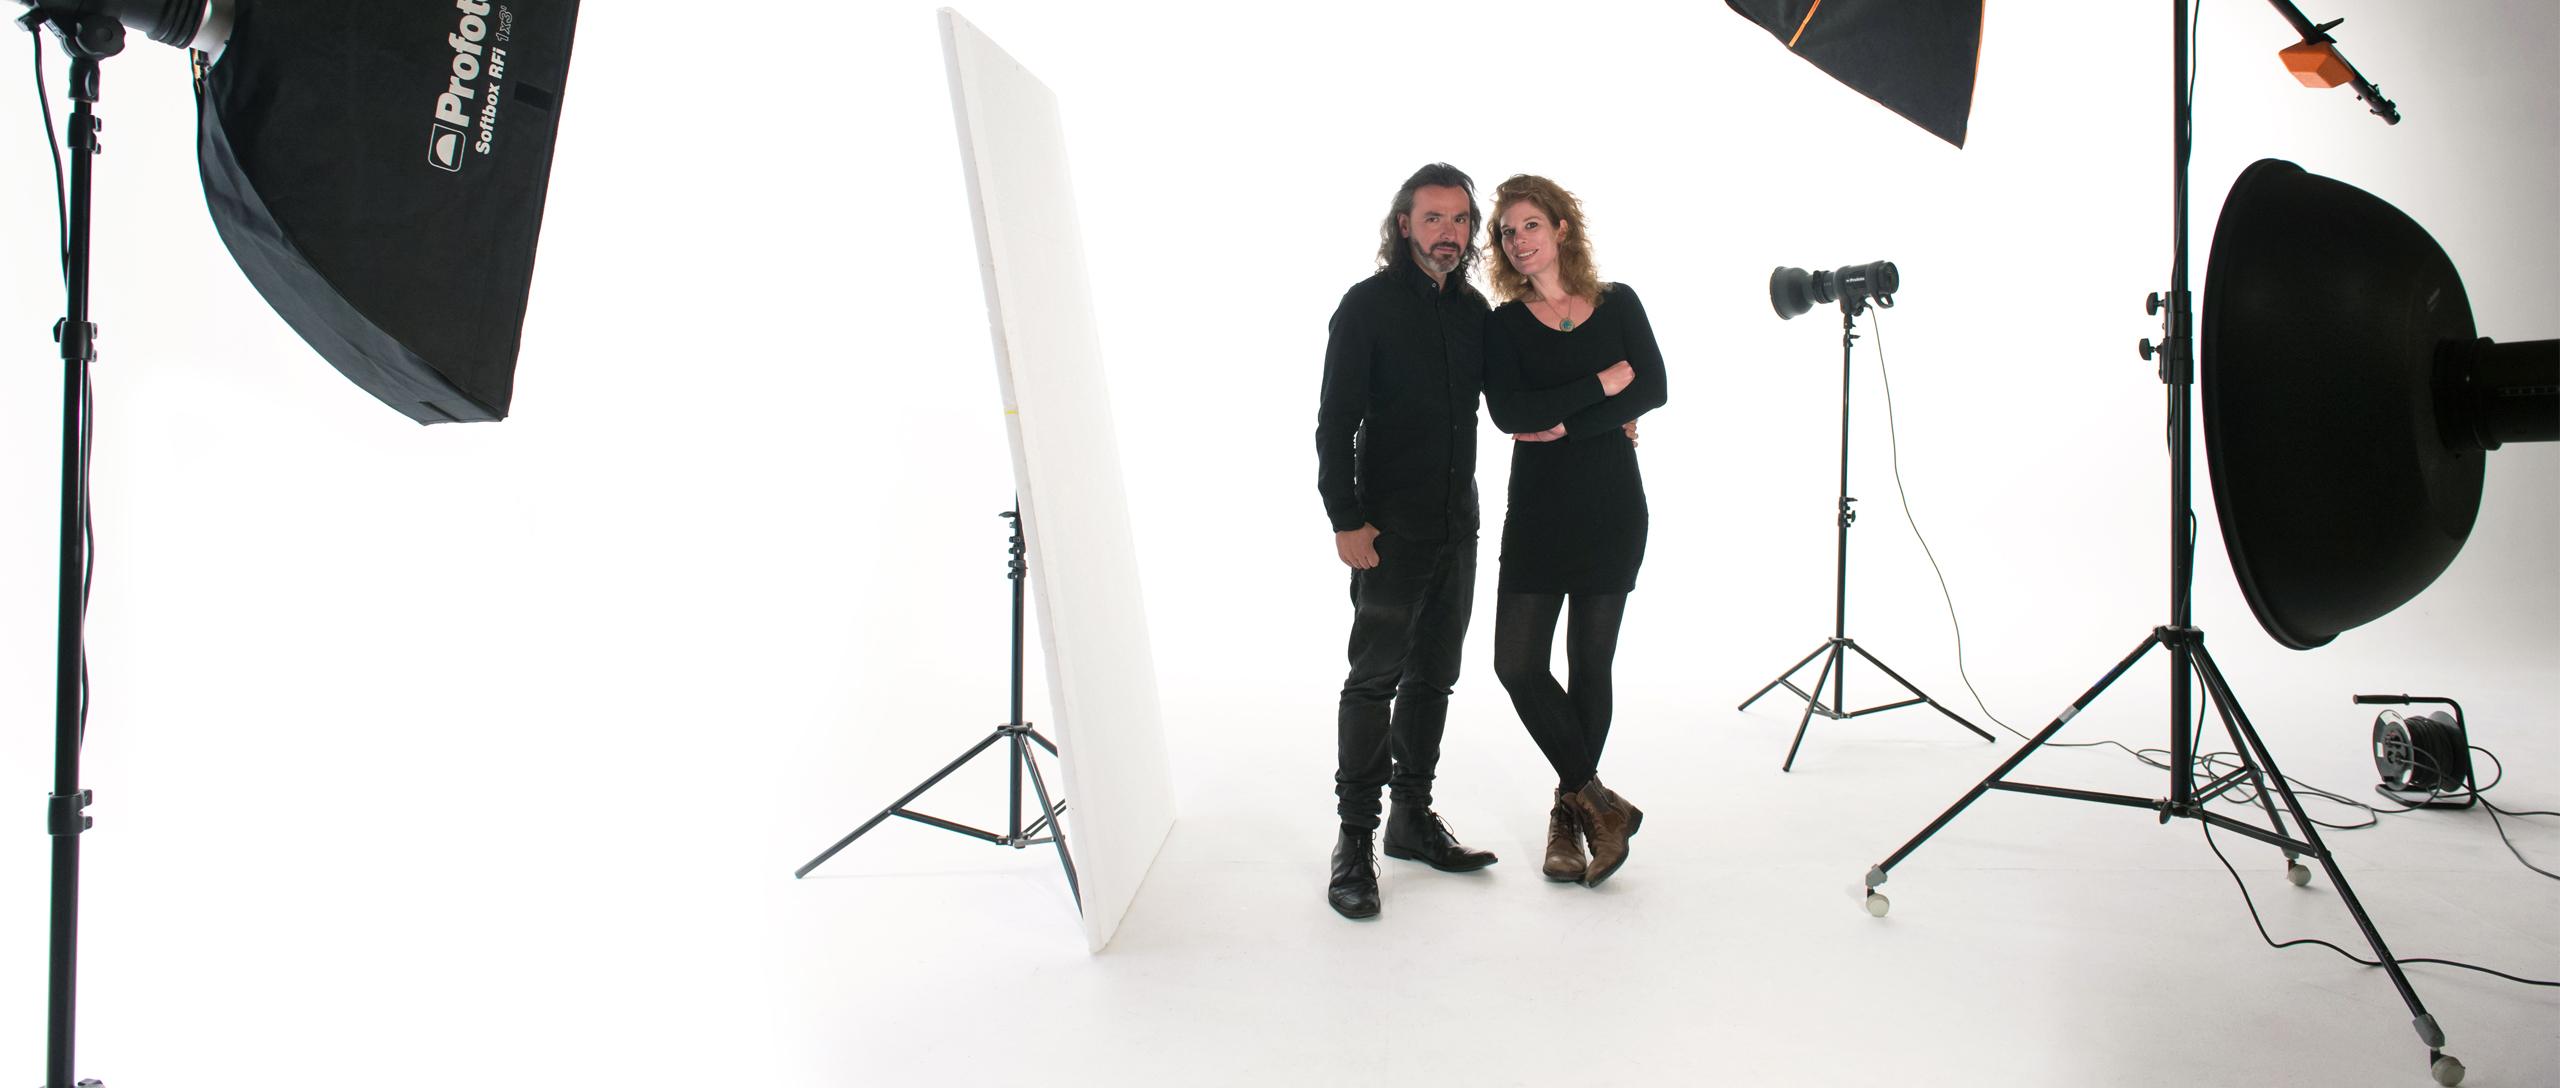 Katherin Wermke y Jesús Manuel Montane en Barcelona Photographer Studio